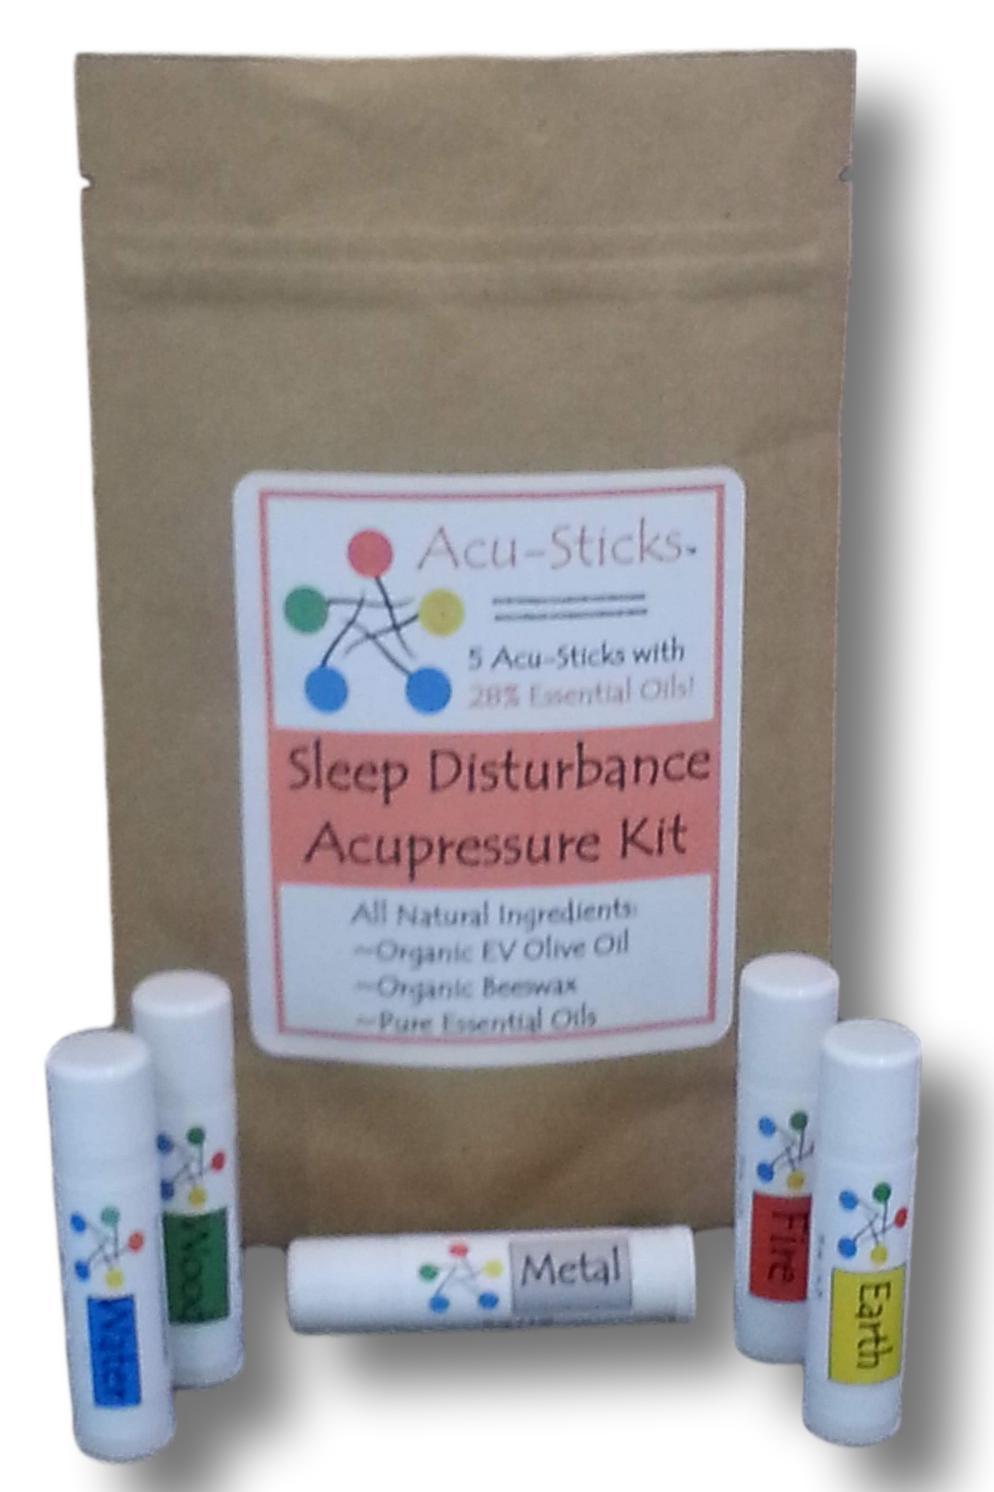 sleep-problems acupressure kit for insomnia